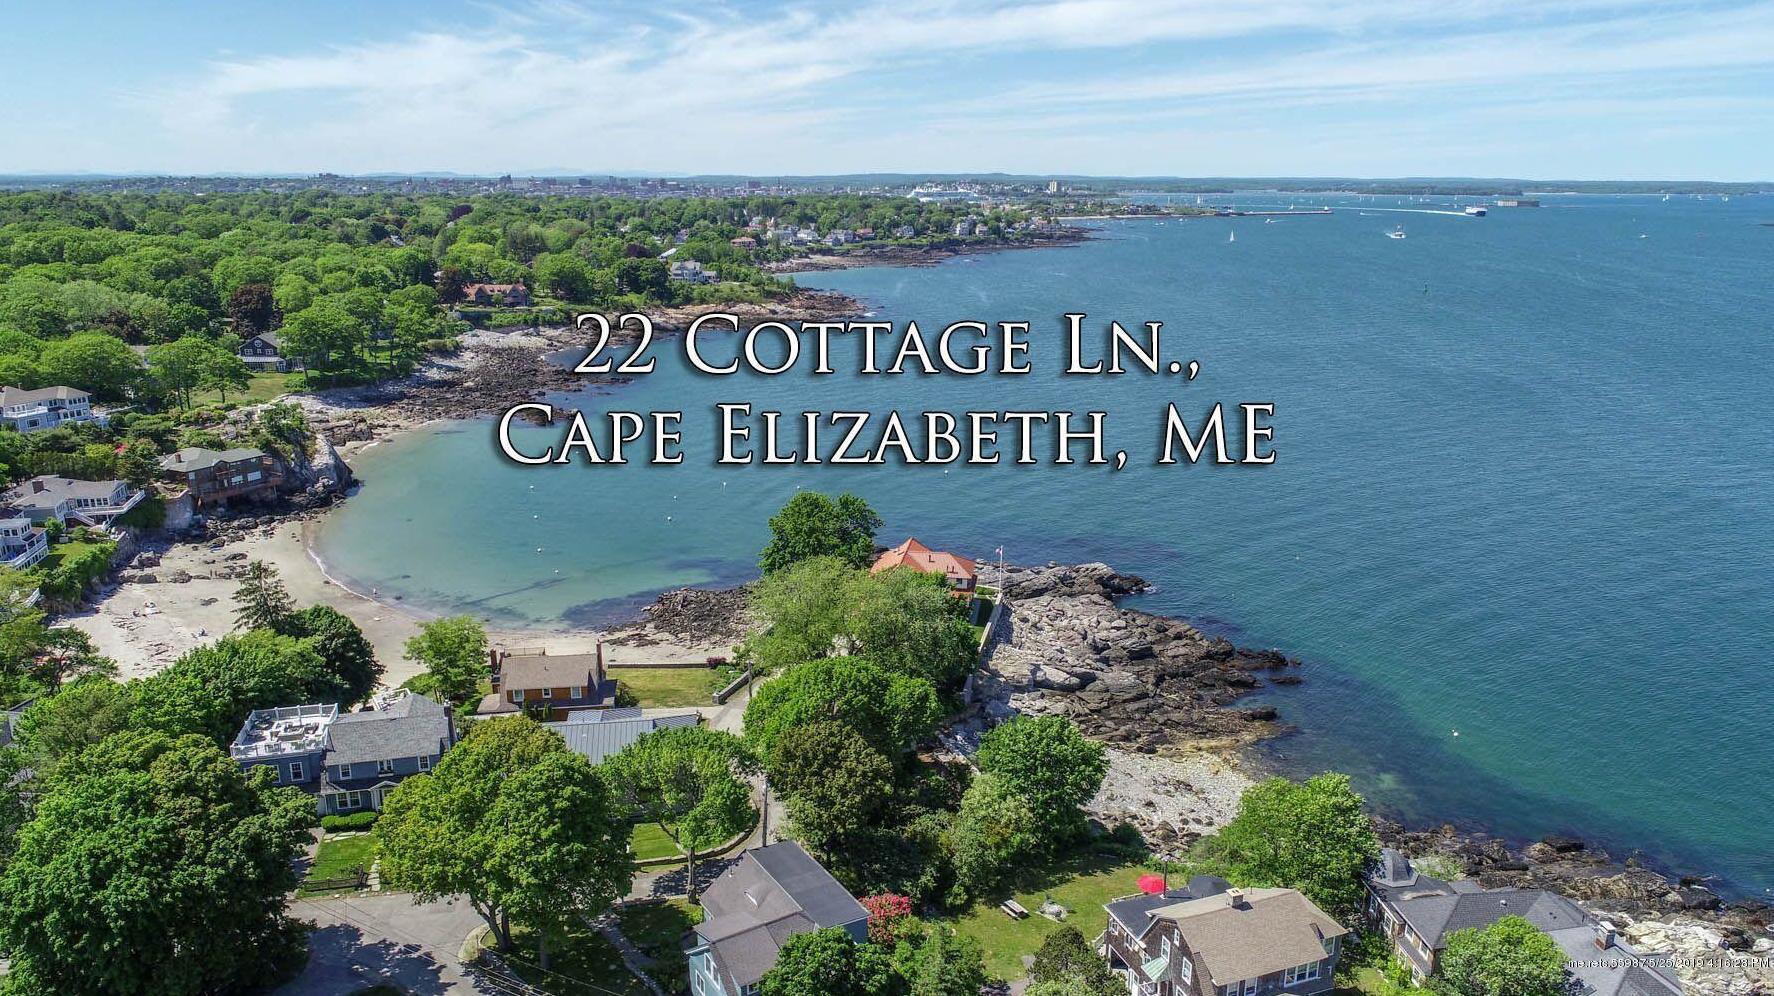 Photo of 22 Cottage Lane Cape Elizabeth ME 04107